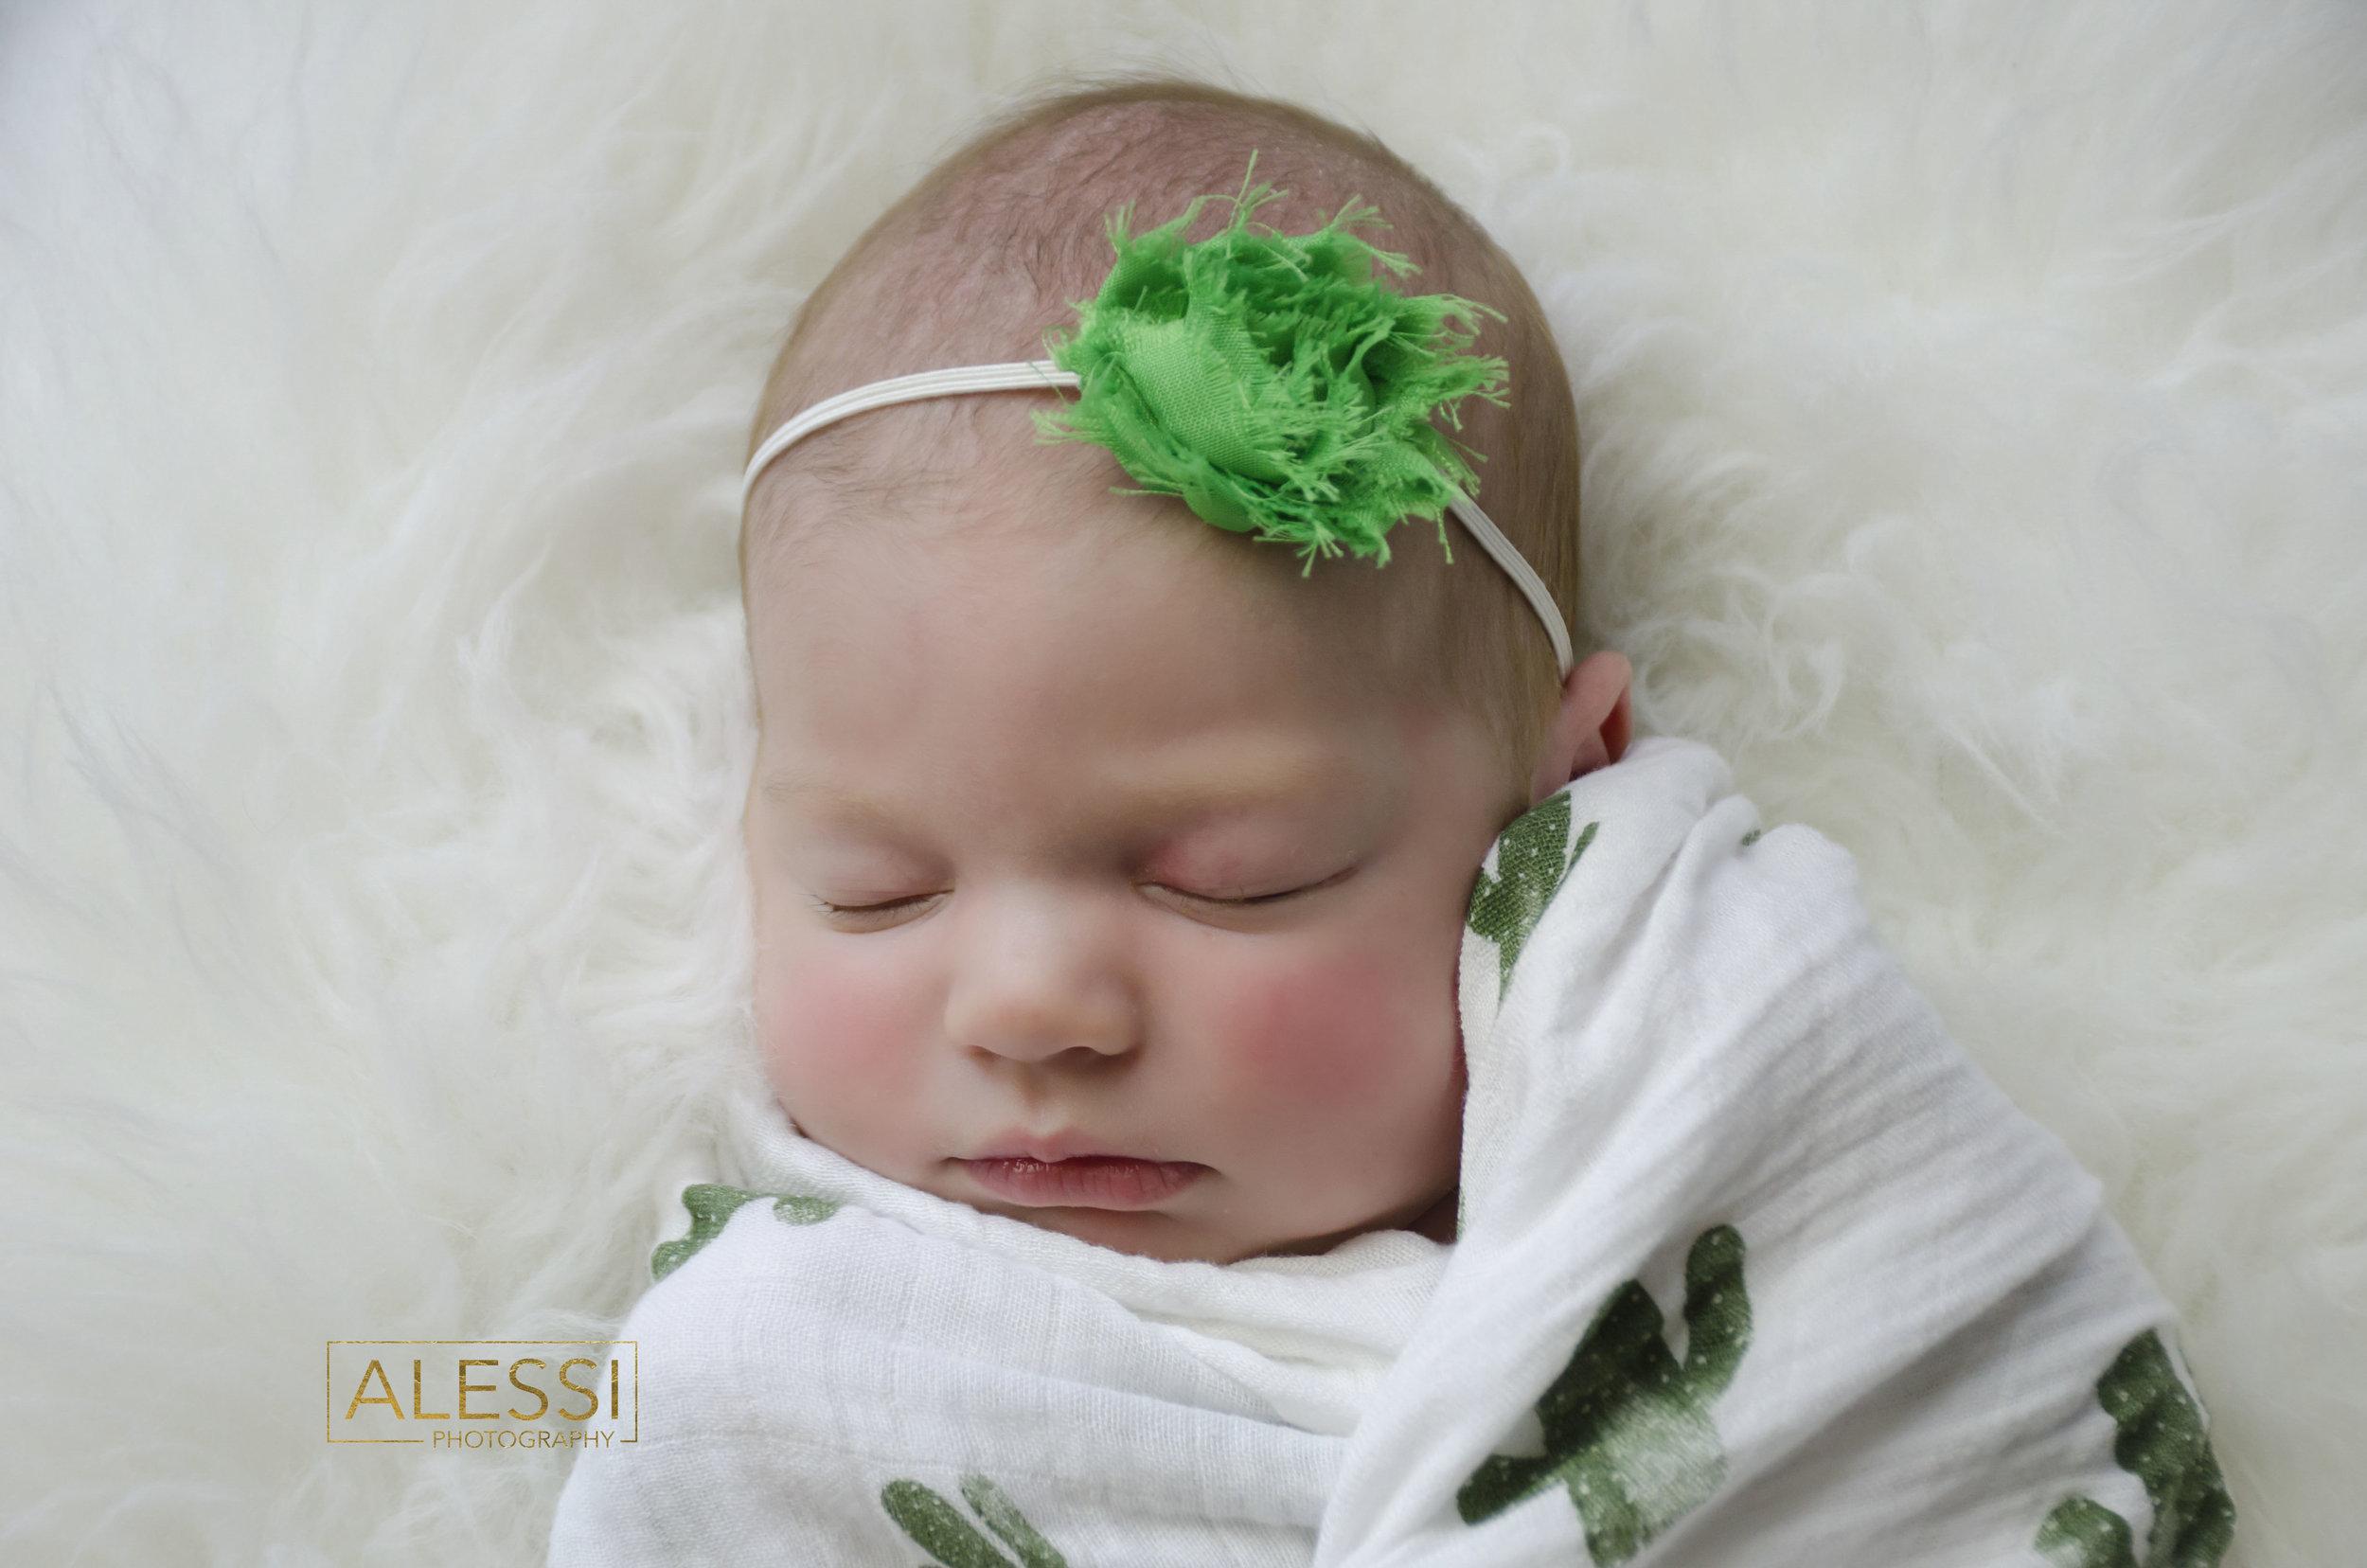 Newborn_P3 copy.jpg